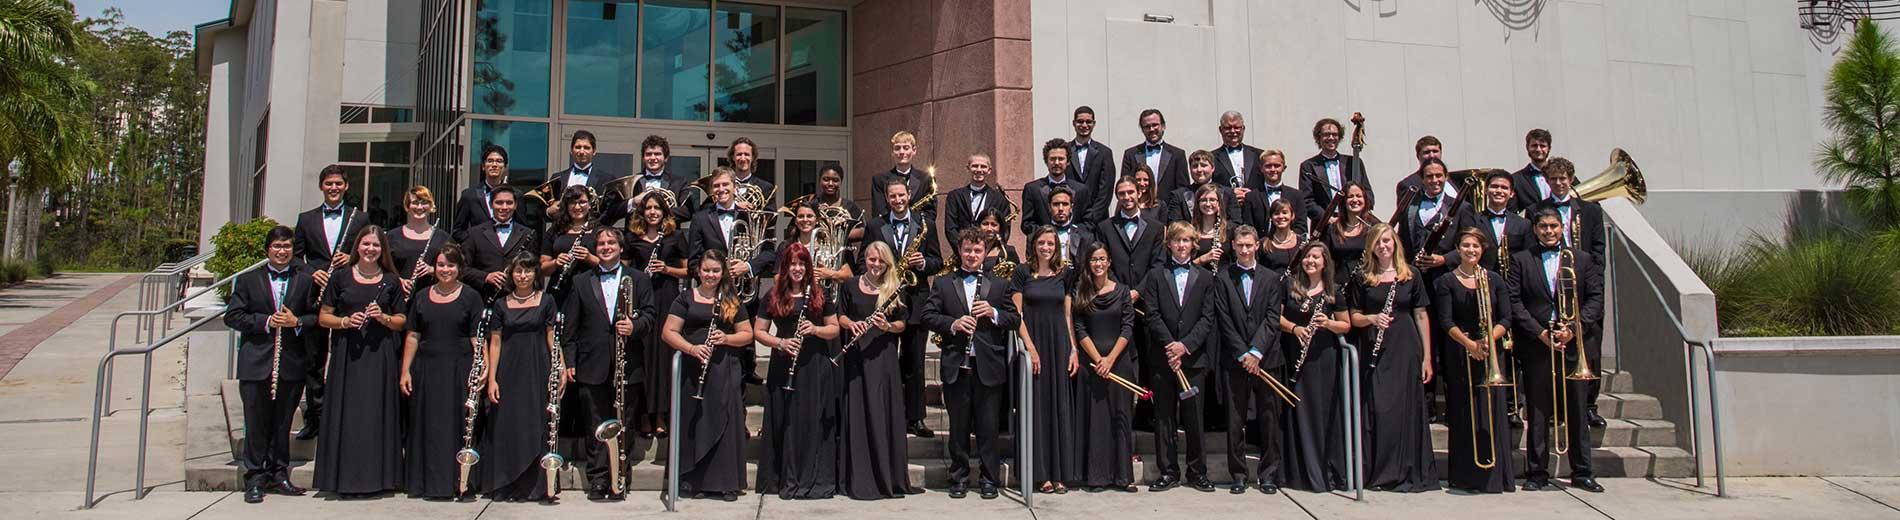 photo shows FGCU Wind Orchestra